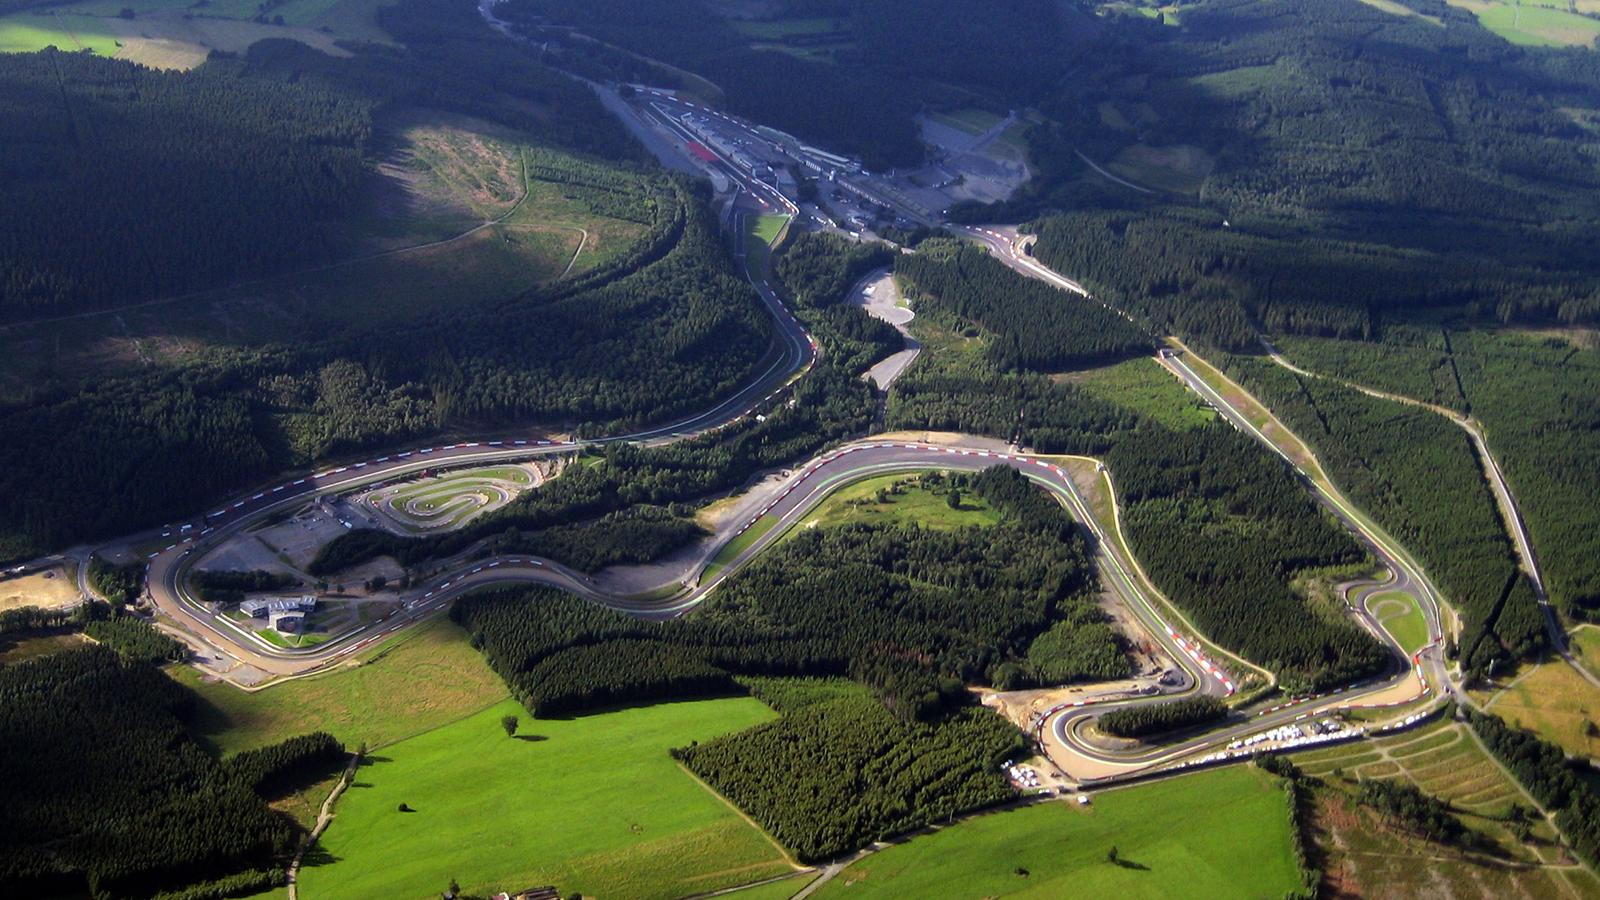 Spa-Francorchamps, Belgium - Round Two, 31 May - 2 June 2019, Spa, BelgiumPure McLaren GT Series> Watch live on TSL